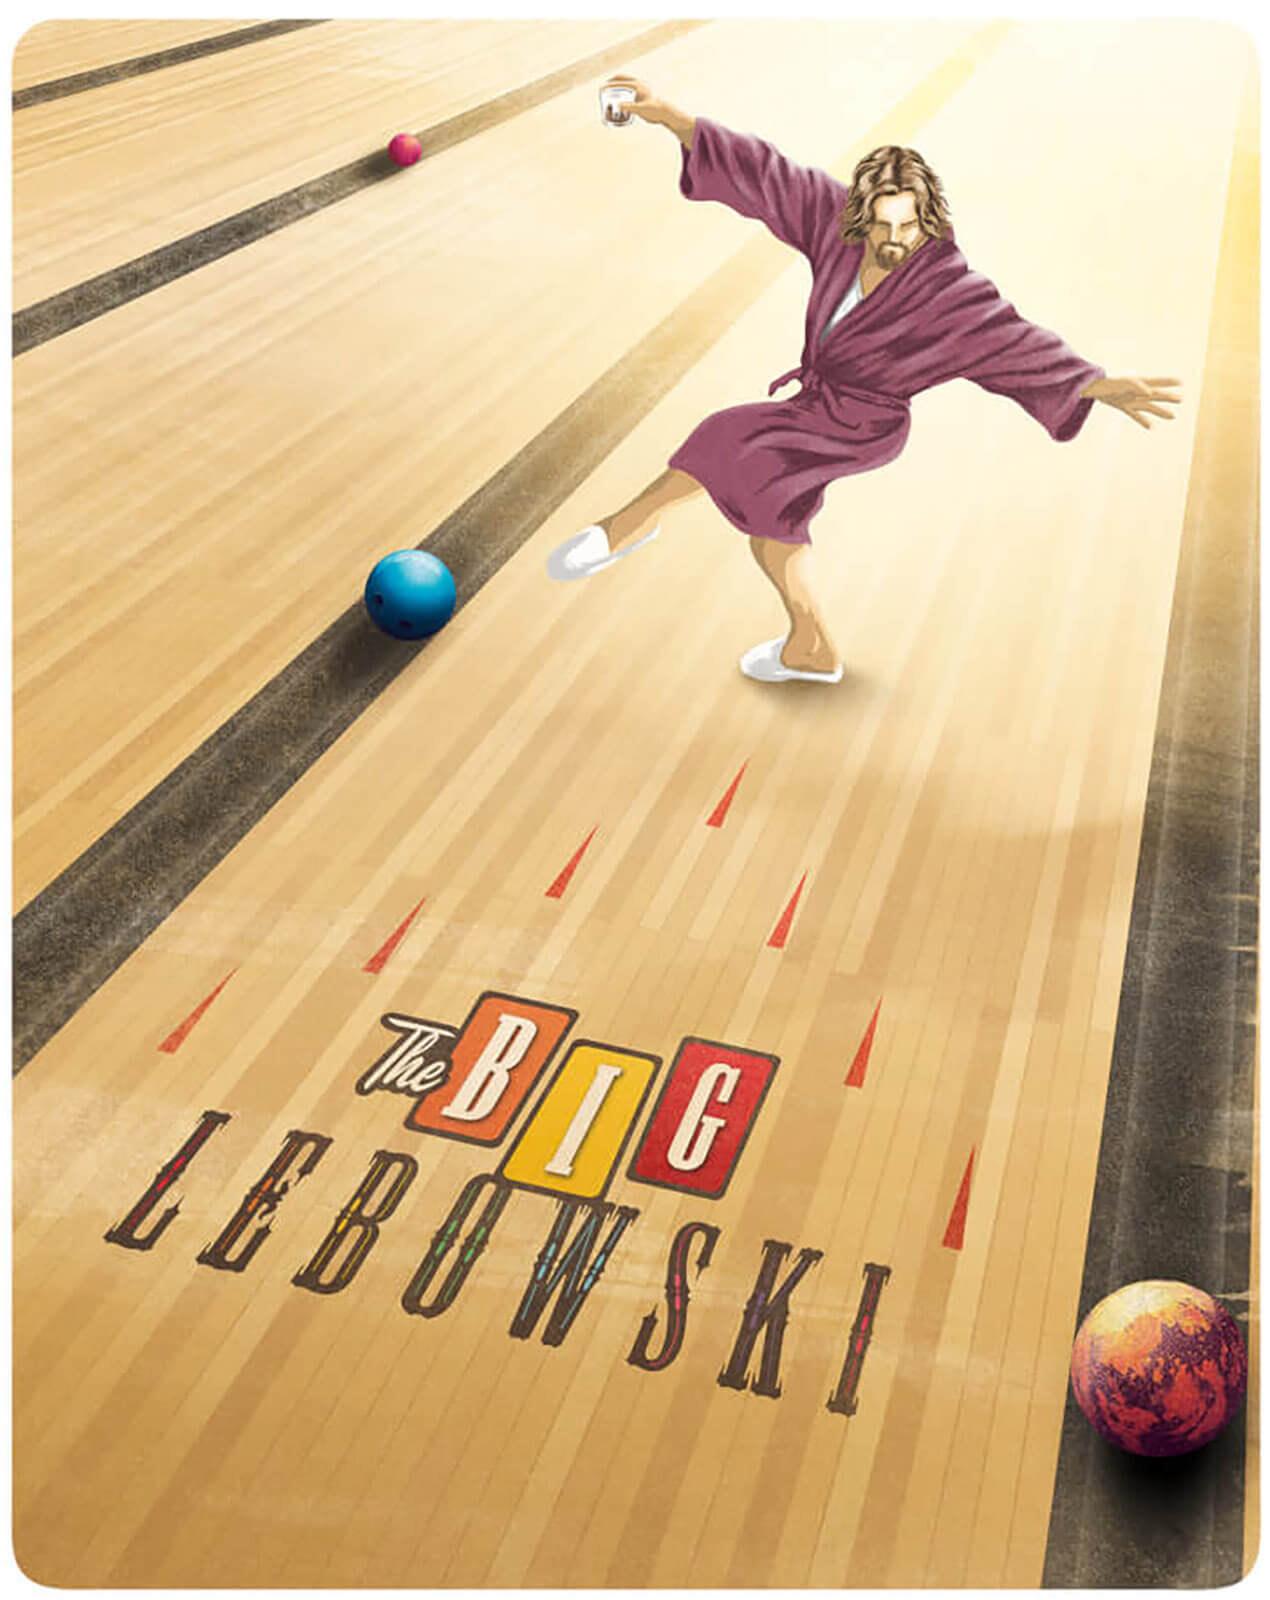 The Big Lebowski Zavvi Exclusive 4K/Blu-Ray Steelbook £11.99 +£1.99 delivery / free for Red Carpet members @ Zavvi